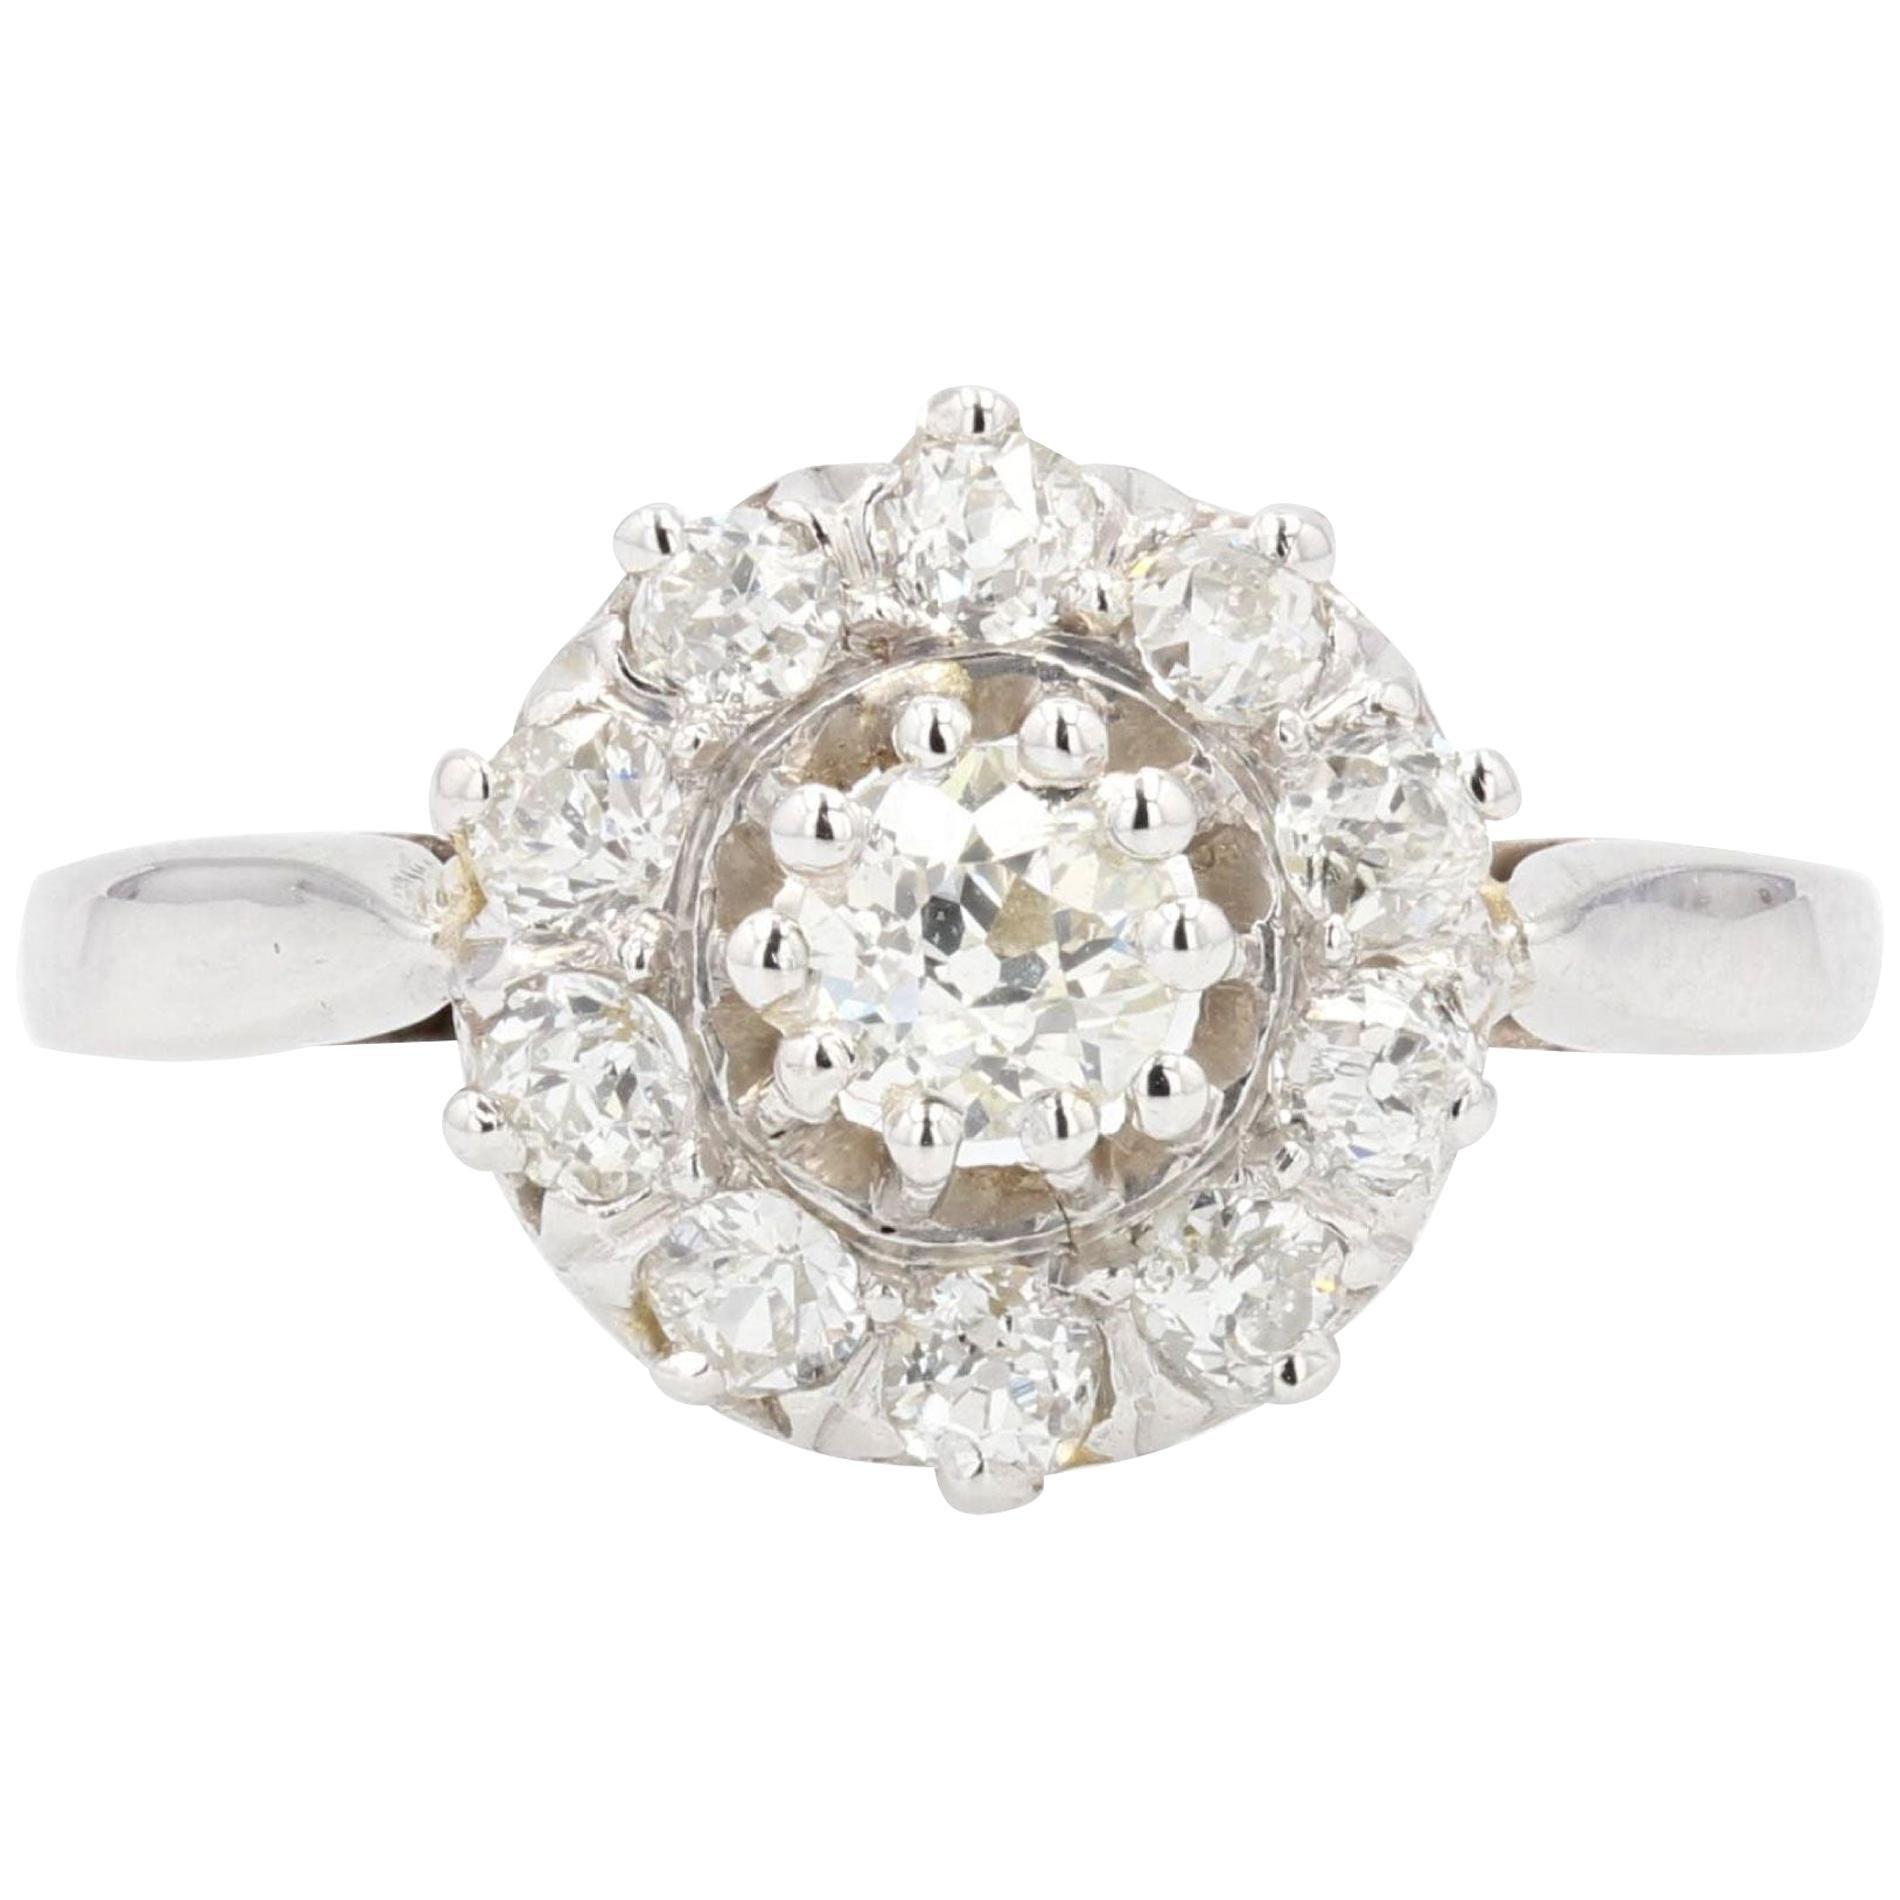 French 1950s Diamonds 18 Karat White Gold Daisy Ring